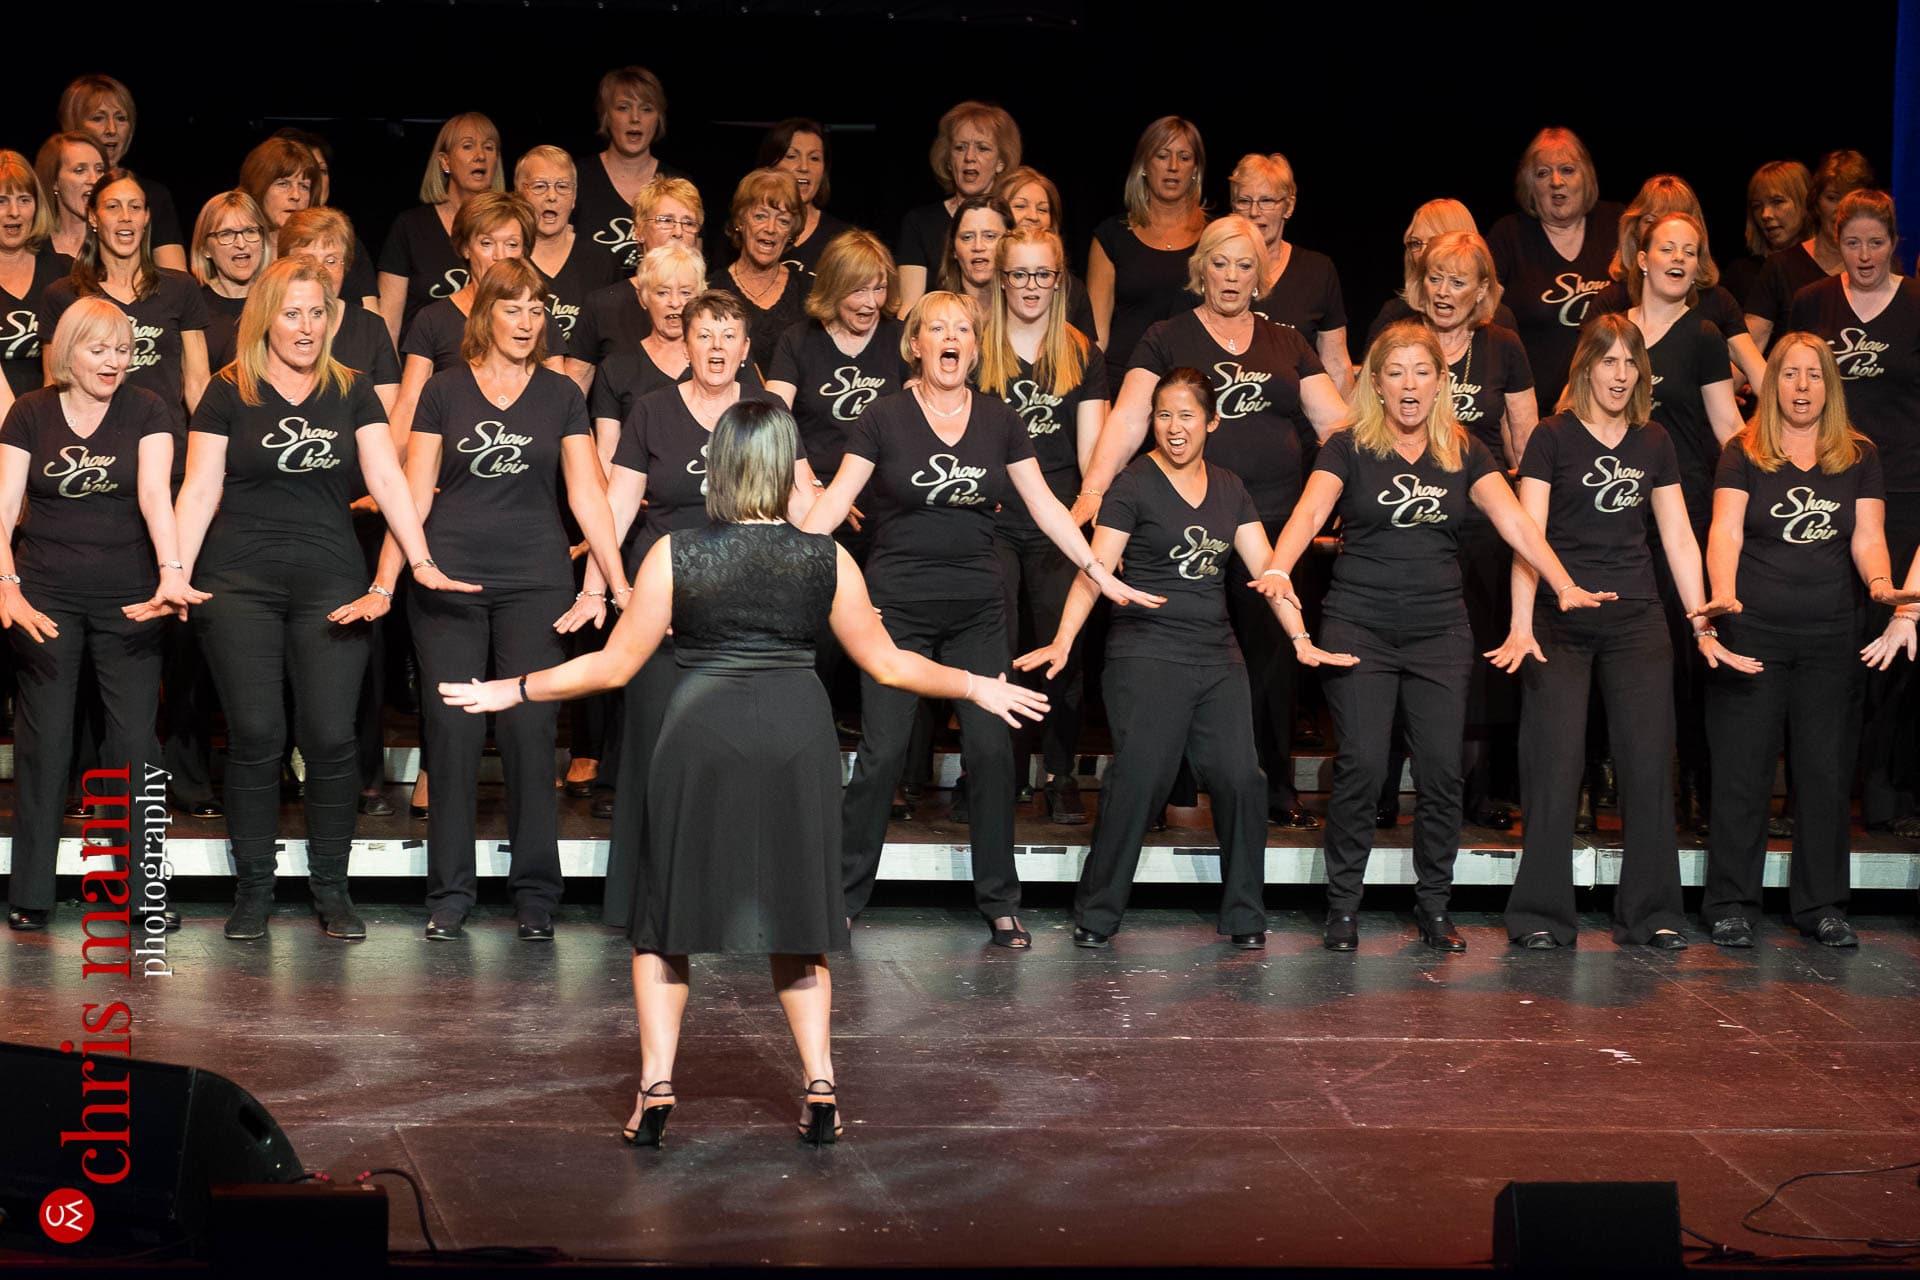 Choiroke-2016-concert-Dorking-Halls-043